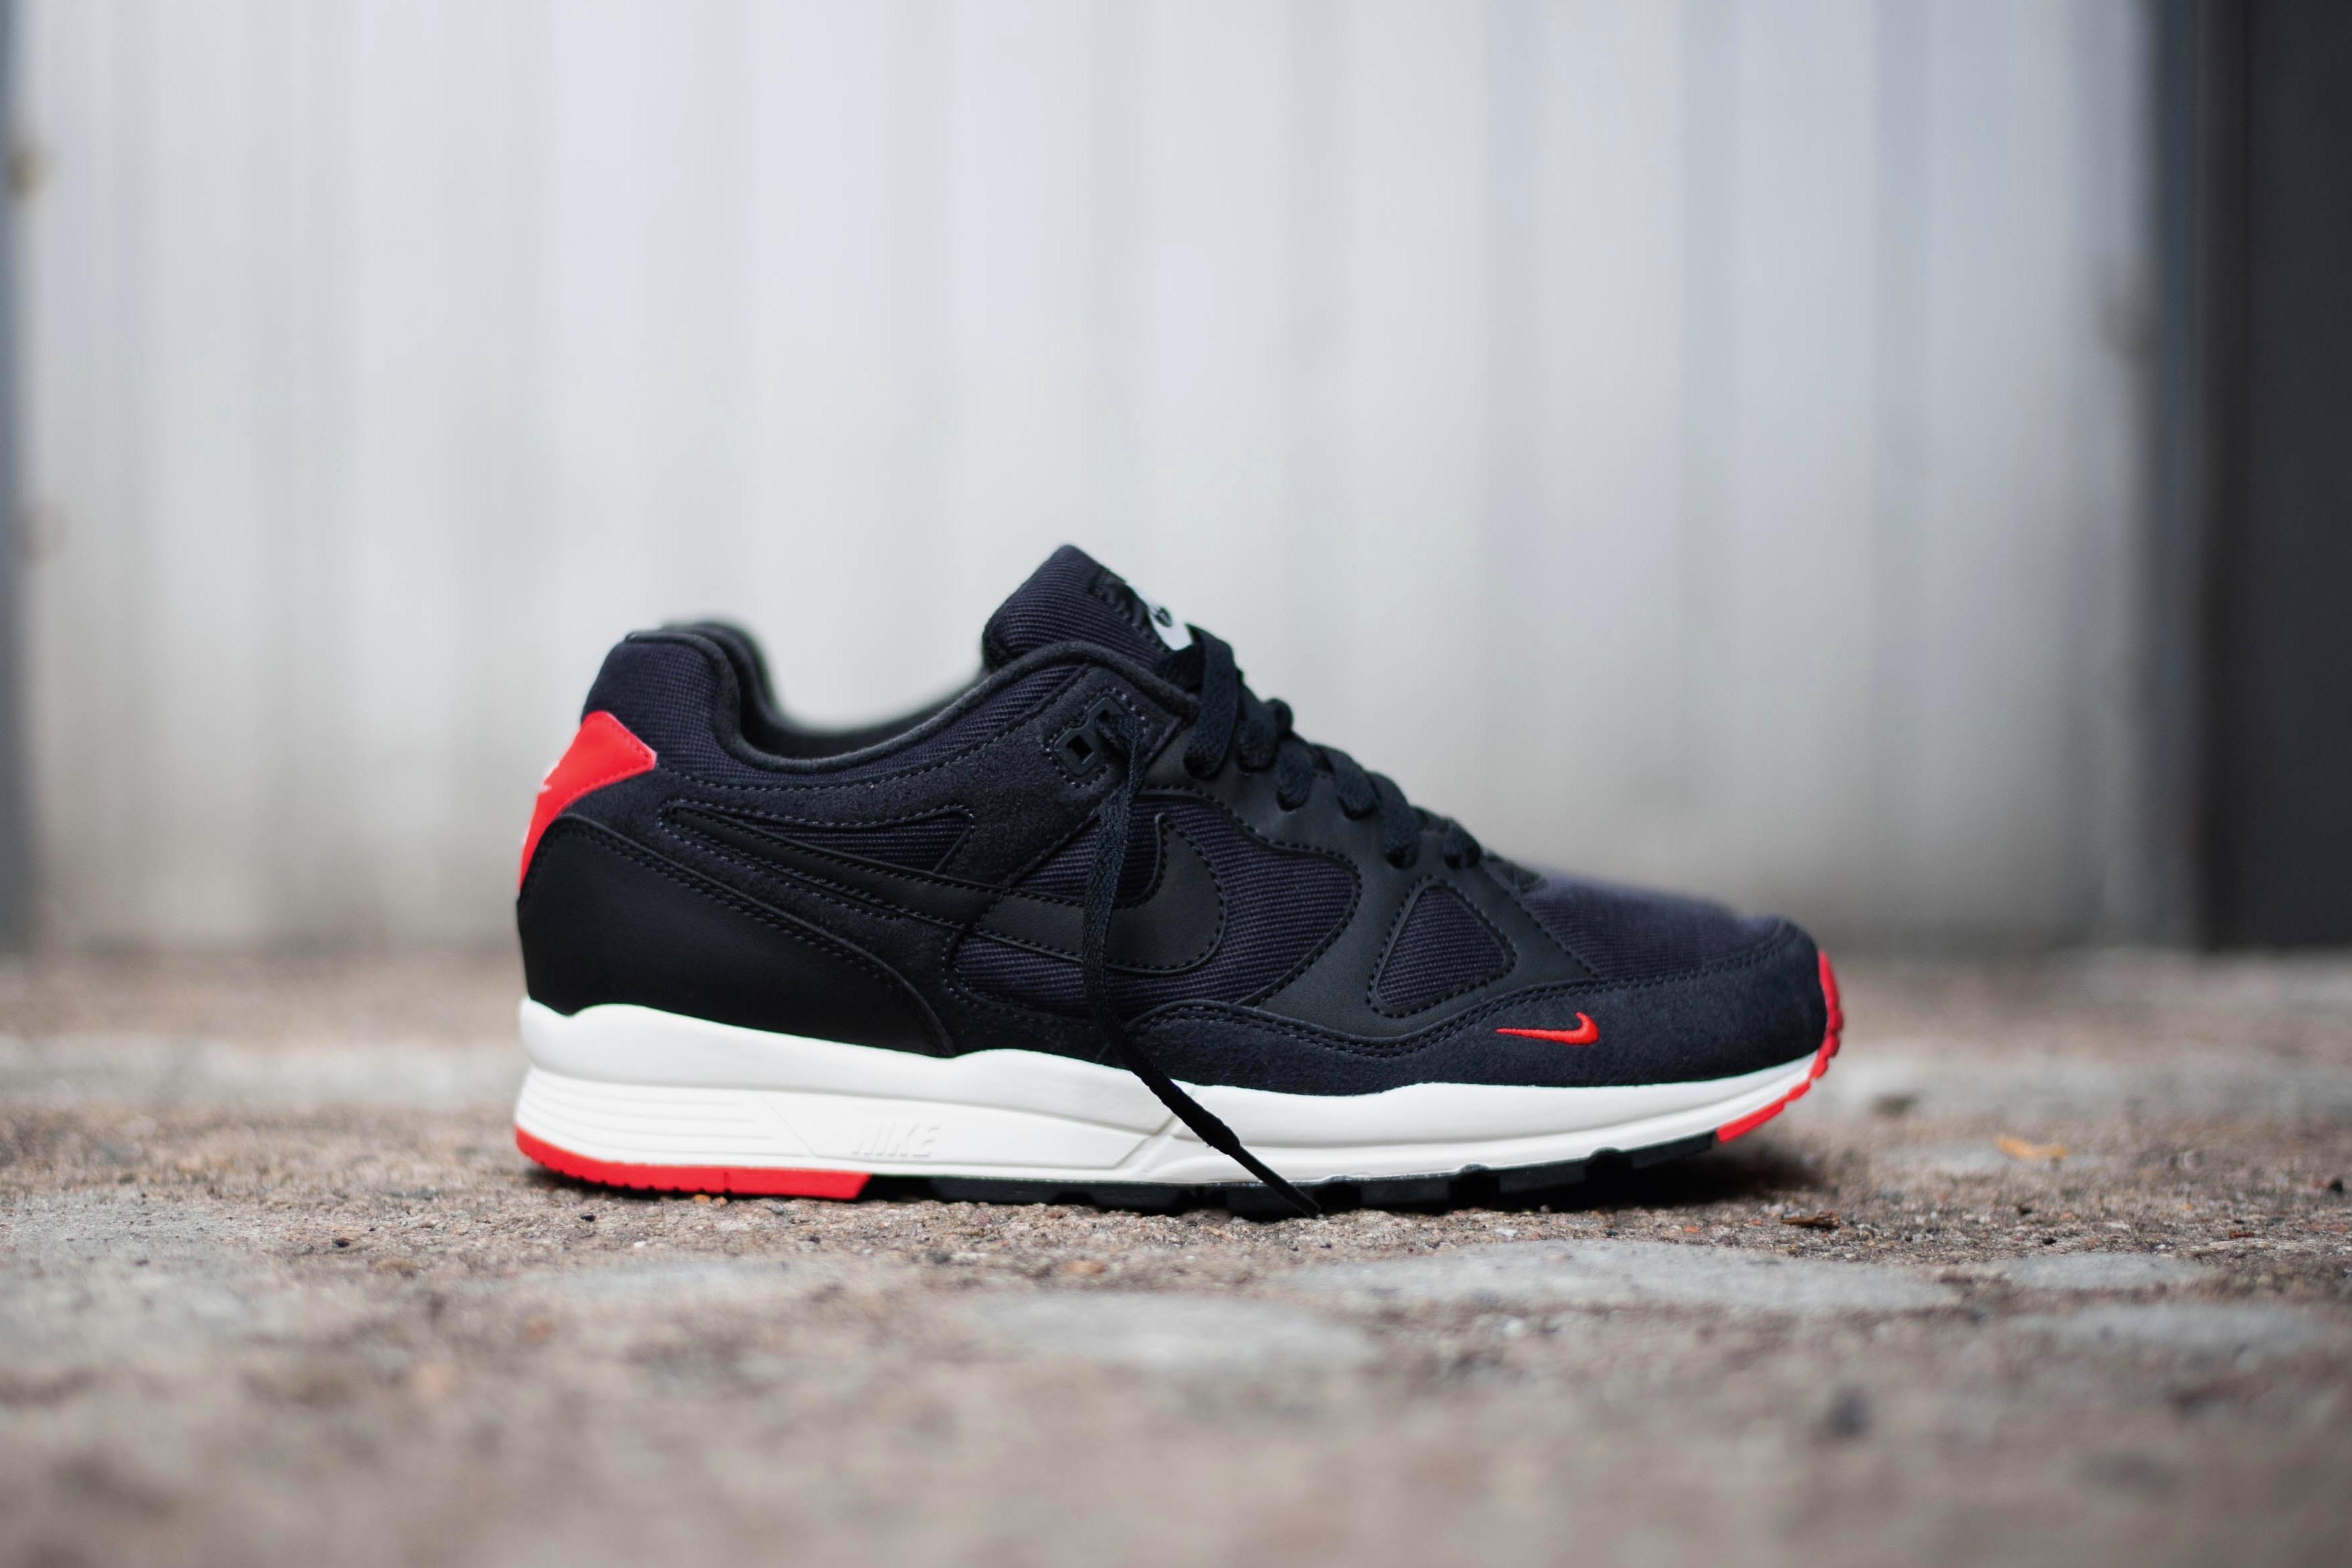 sale retailer 7af7f 4e182 Nike Air Span II SE – Oil Grey   University Red   Sail   Black – STASP